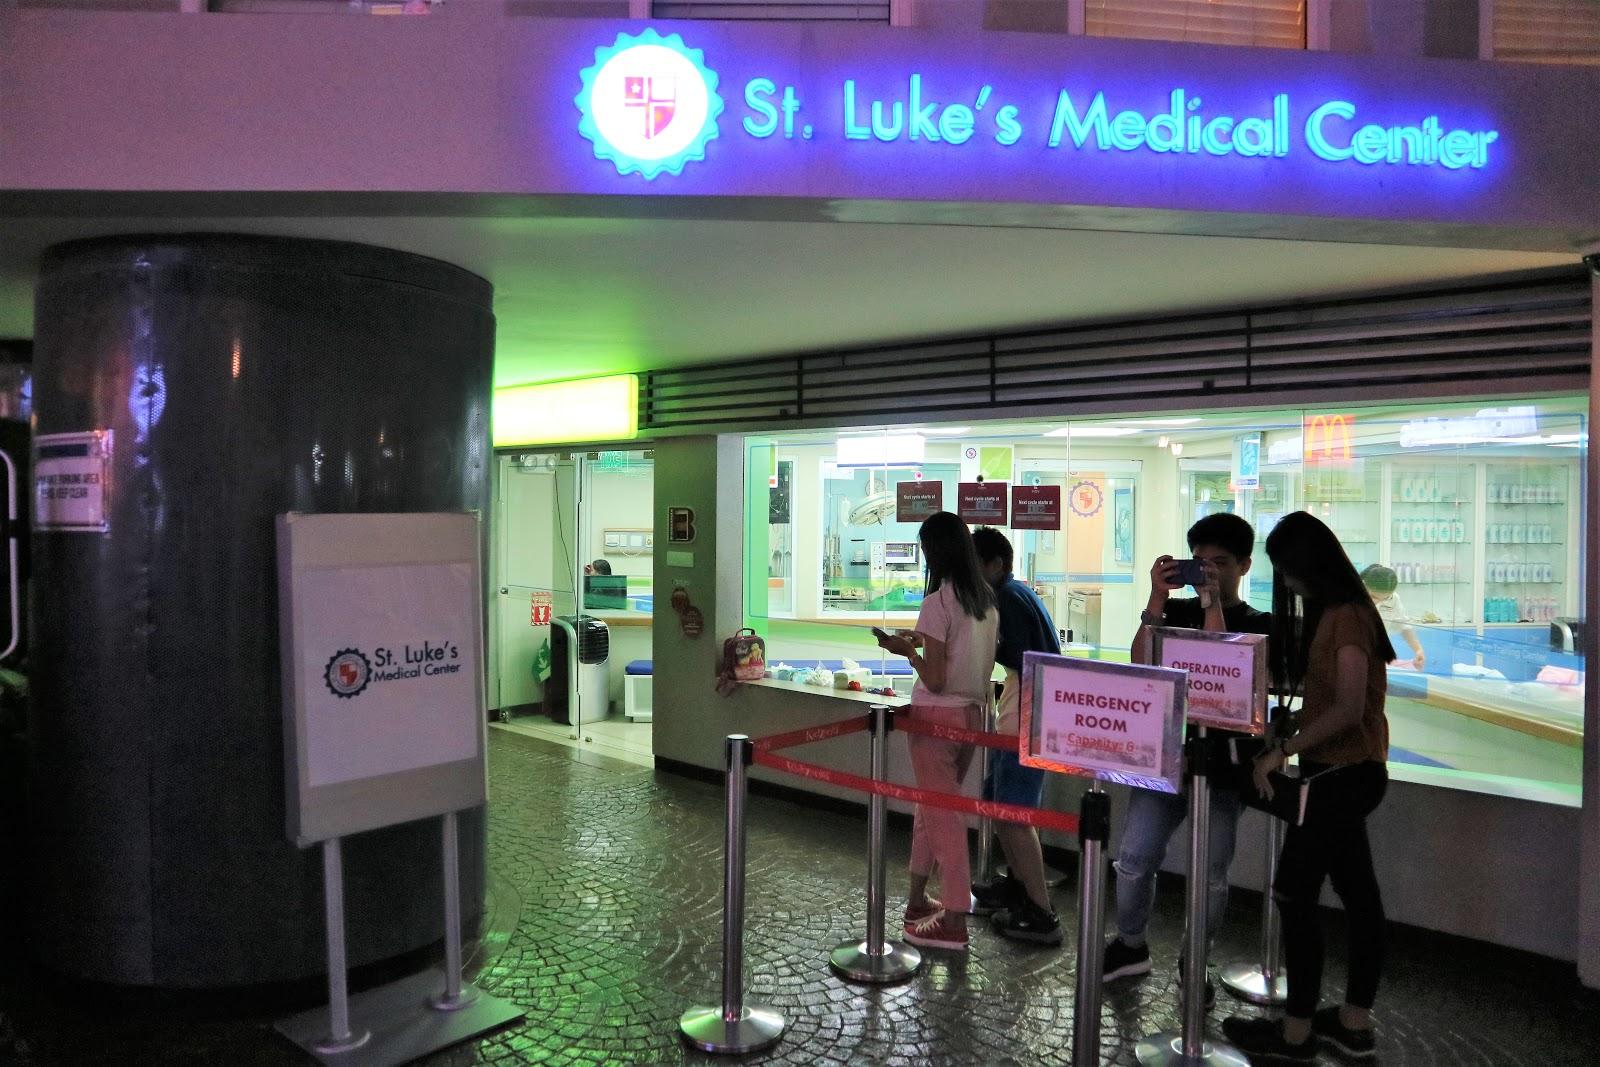 St. Luke's Medical Center in KidZania Manila